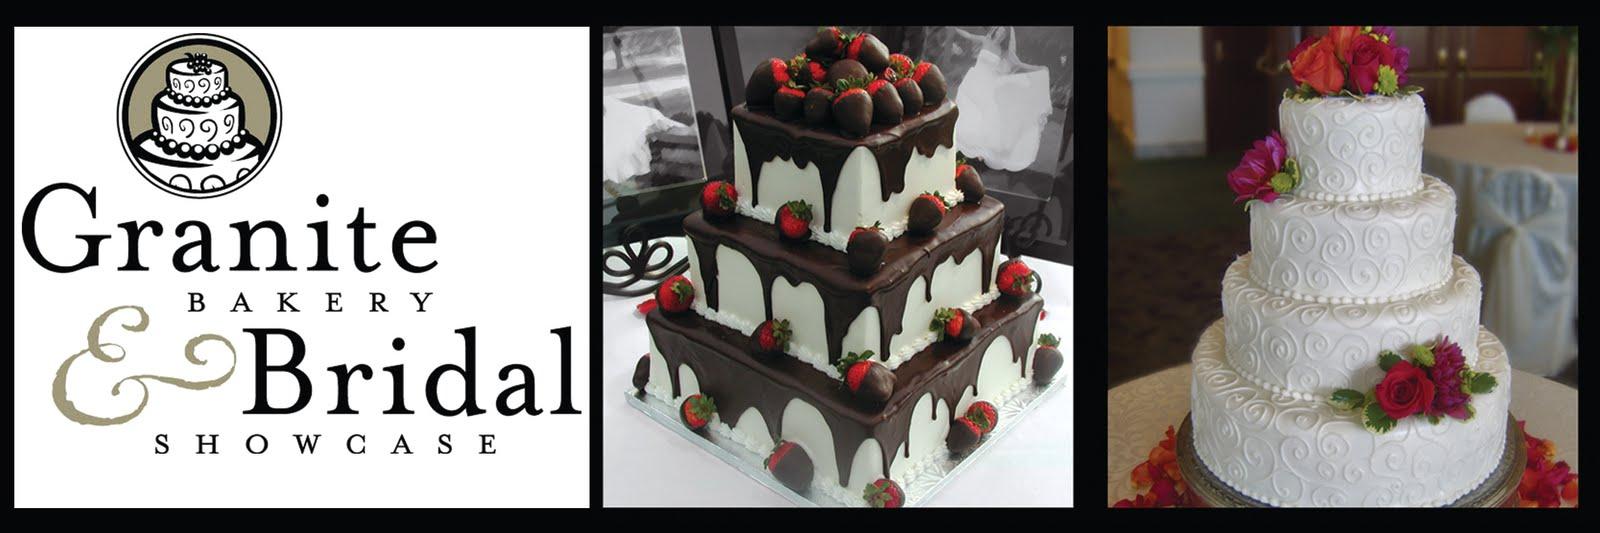 Granite Bakery & Bridal Showcase